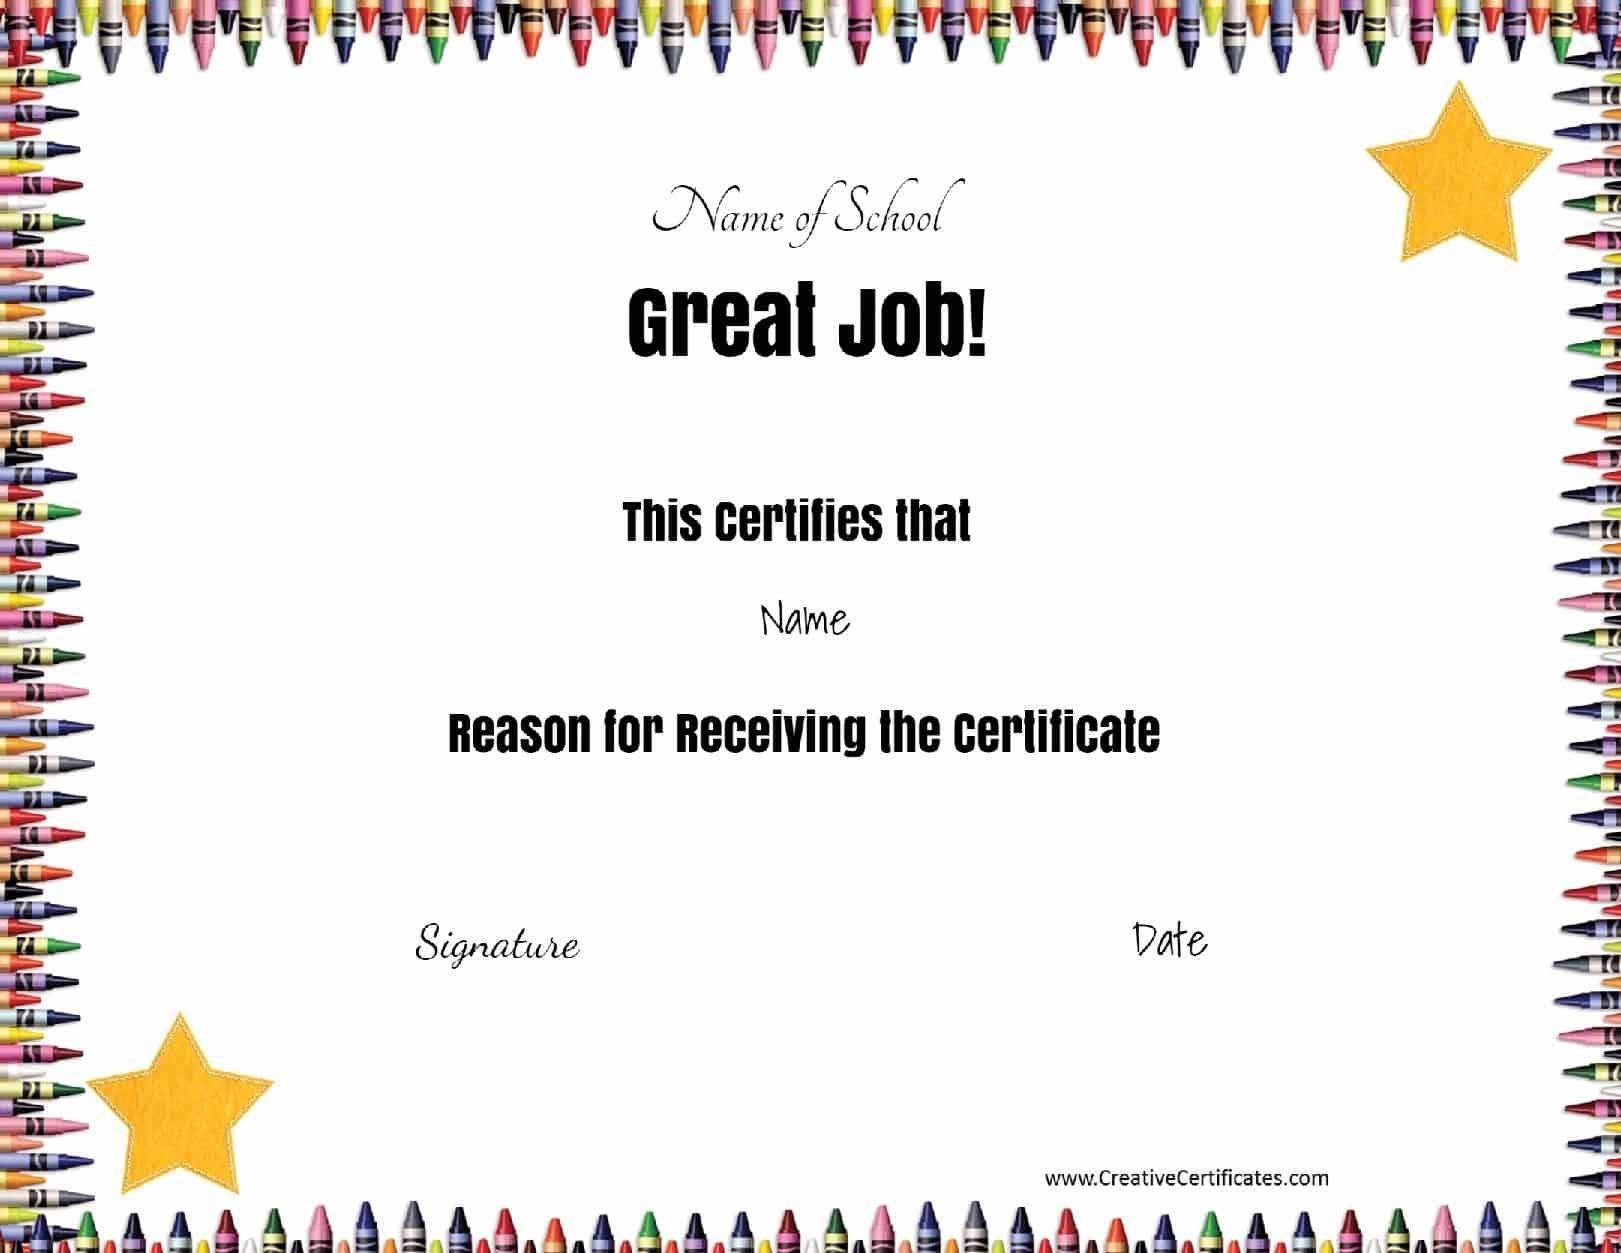 Free School Certificates & Awards - Free Printable School Certificates Templates